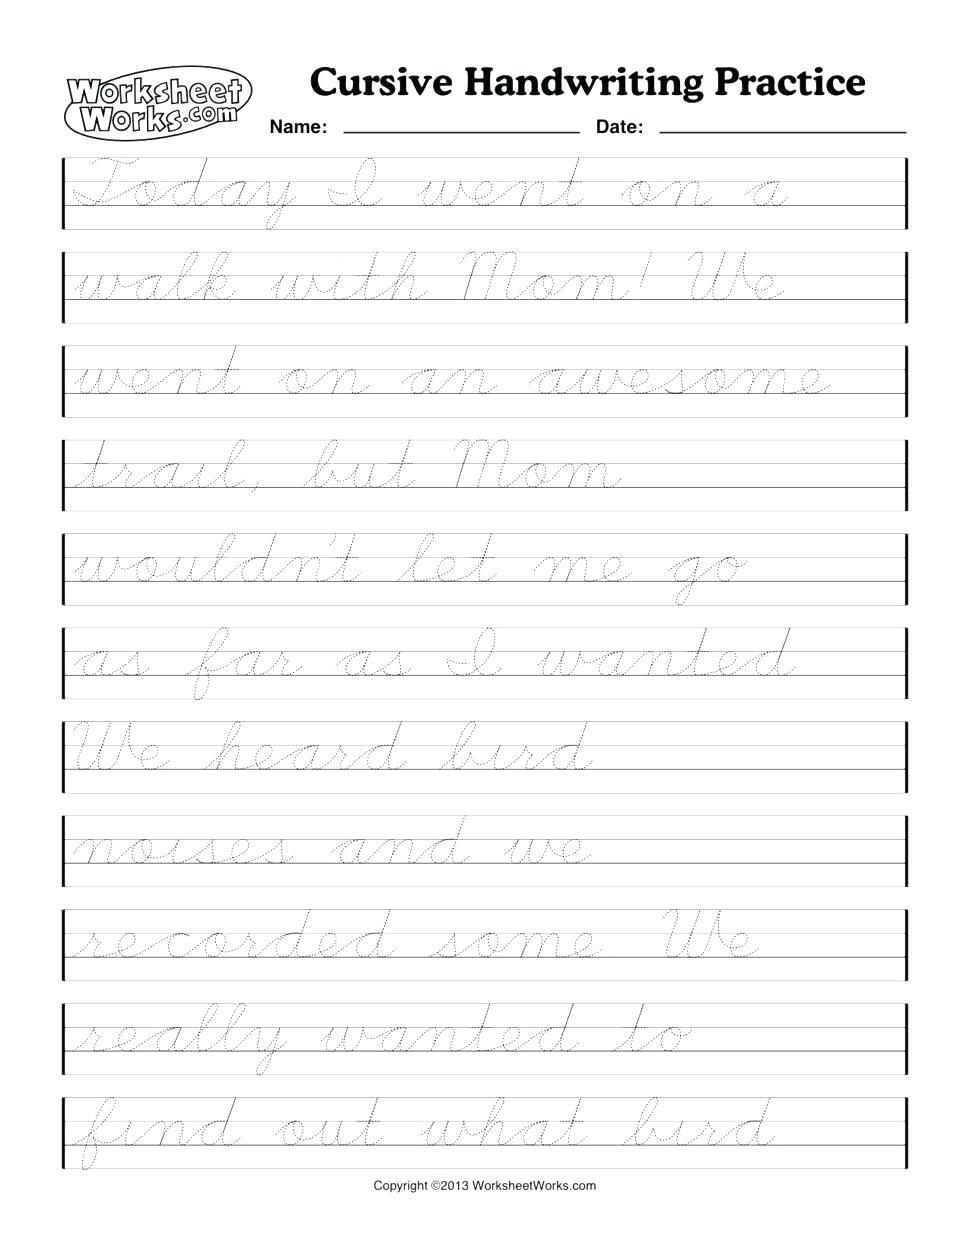 Printable Cursive Writing Worksheets Pdf Cursive Handwriting - Free Printable Script Writing Worksheets